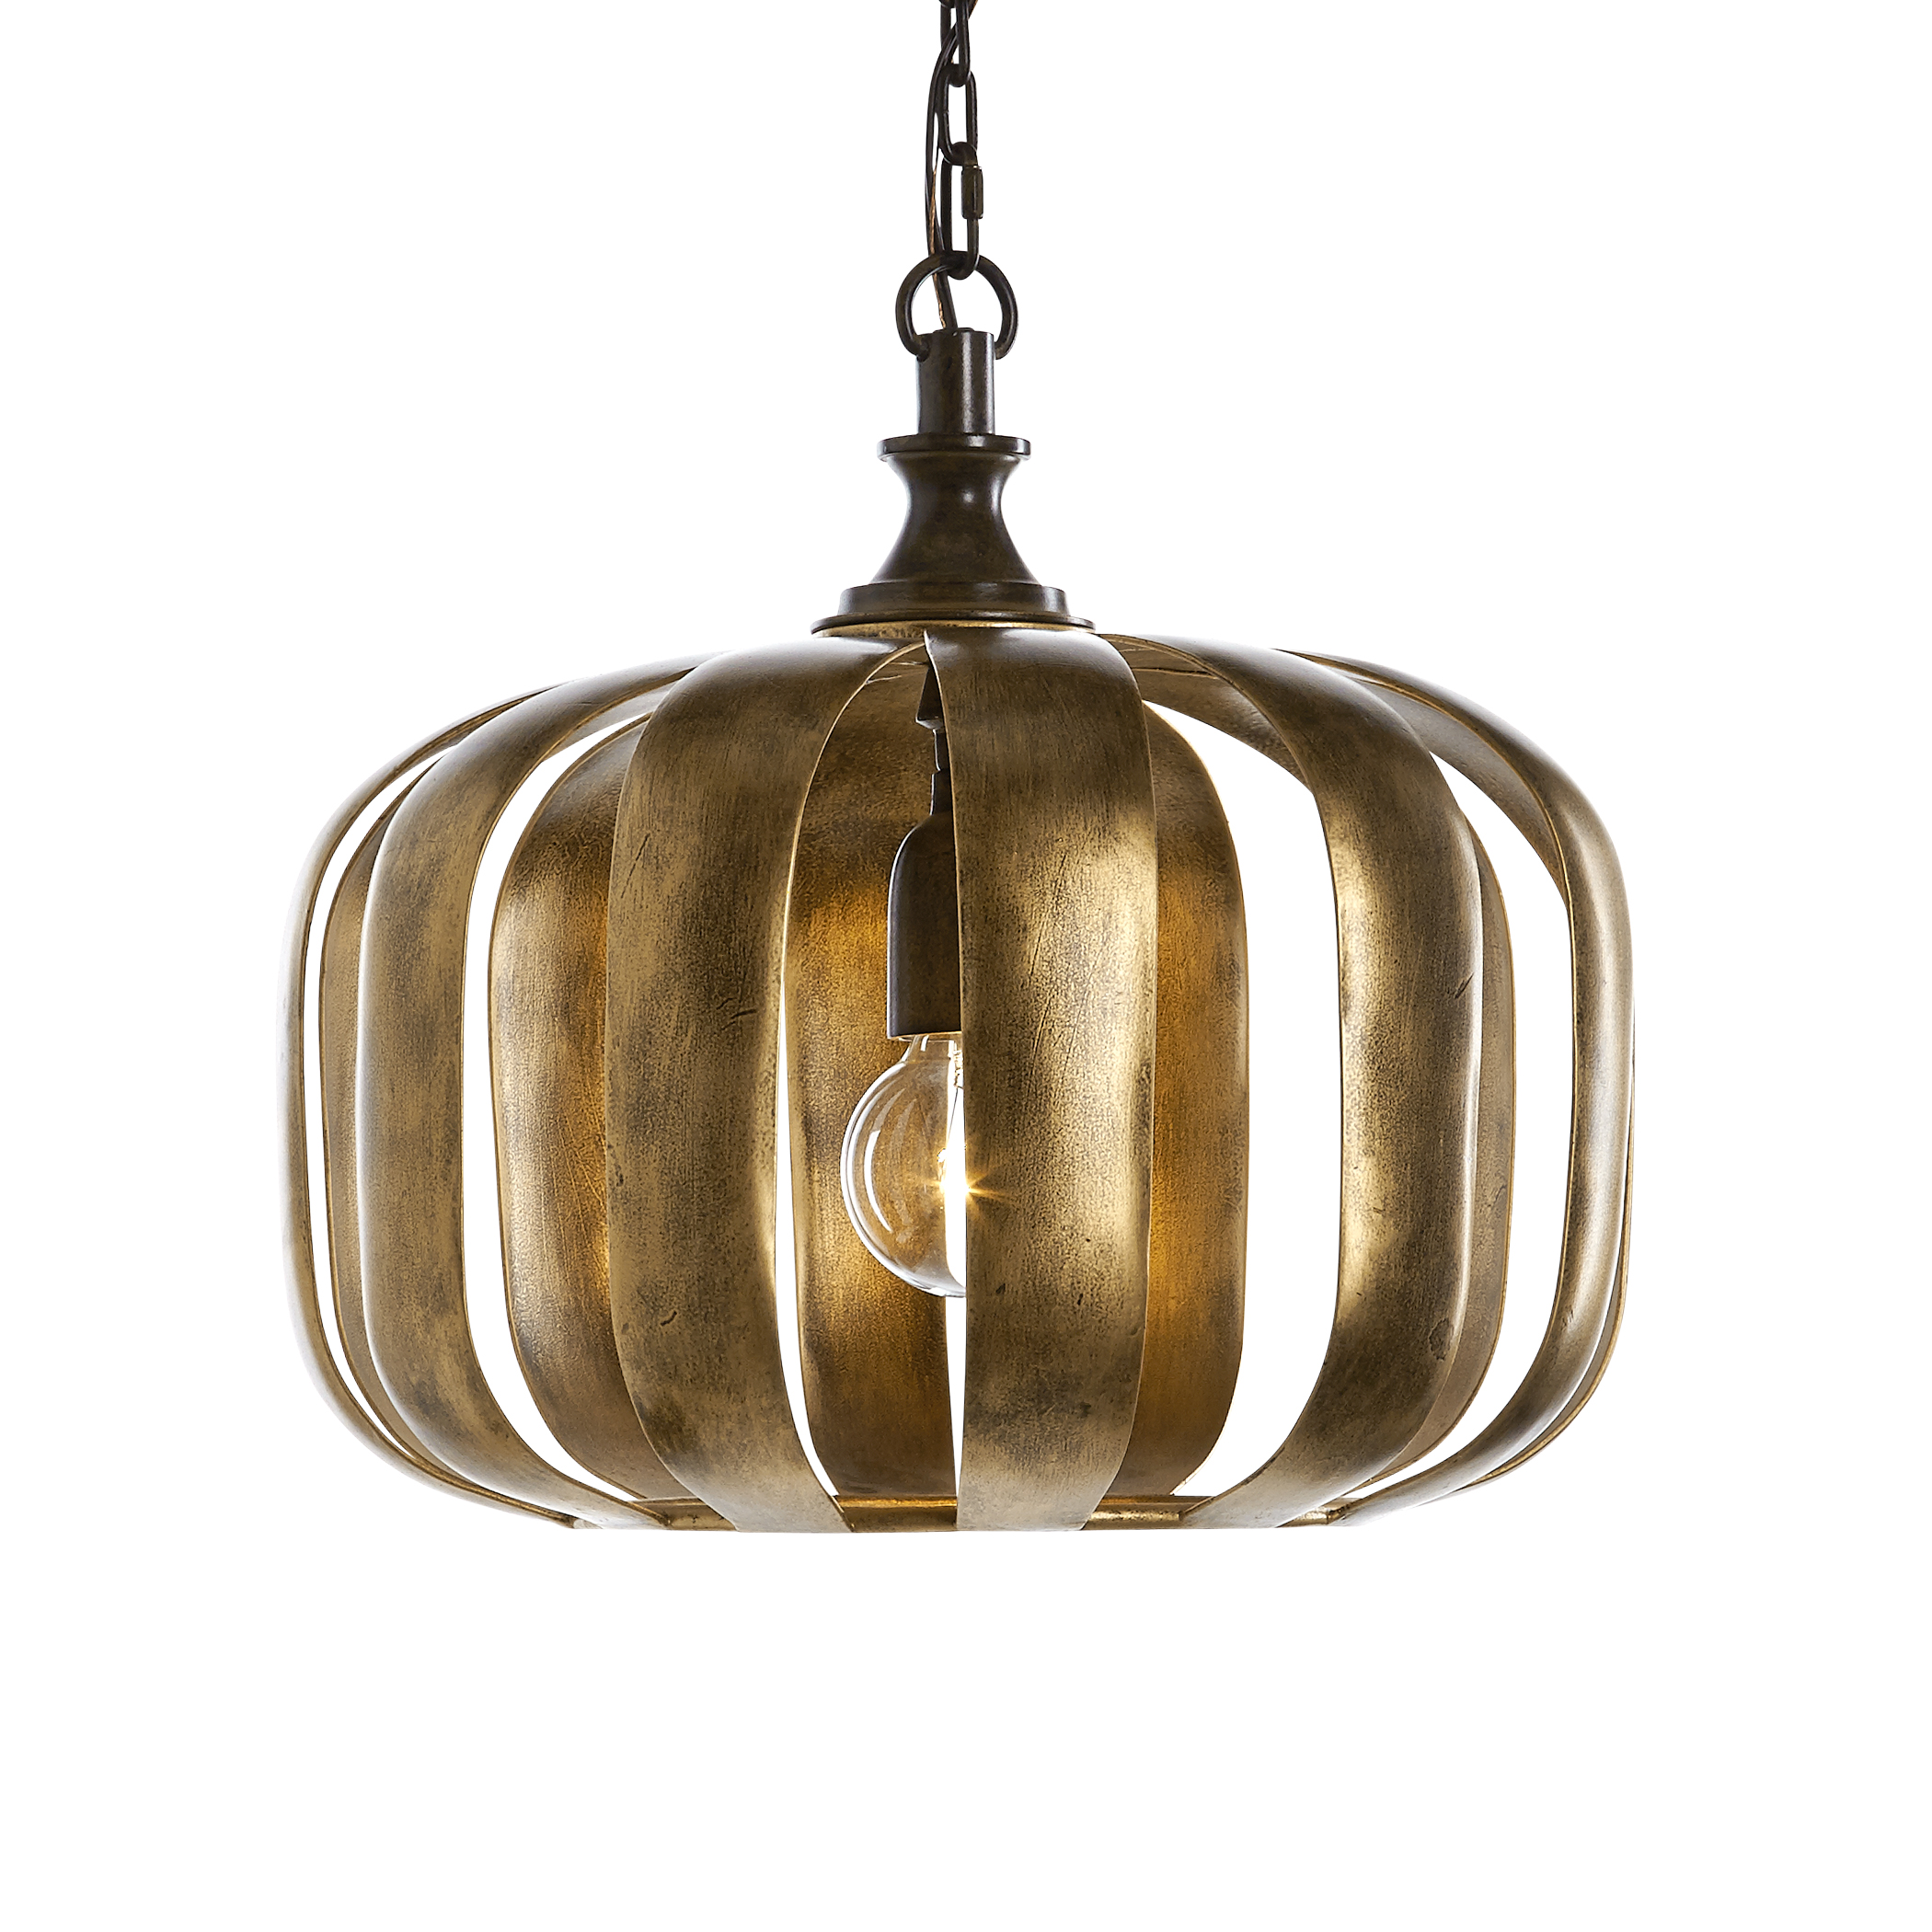 Uttermost Lighting Fixtures Zucca 1 Light Antique Gold Pendant - Item Number: 22035